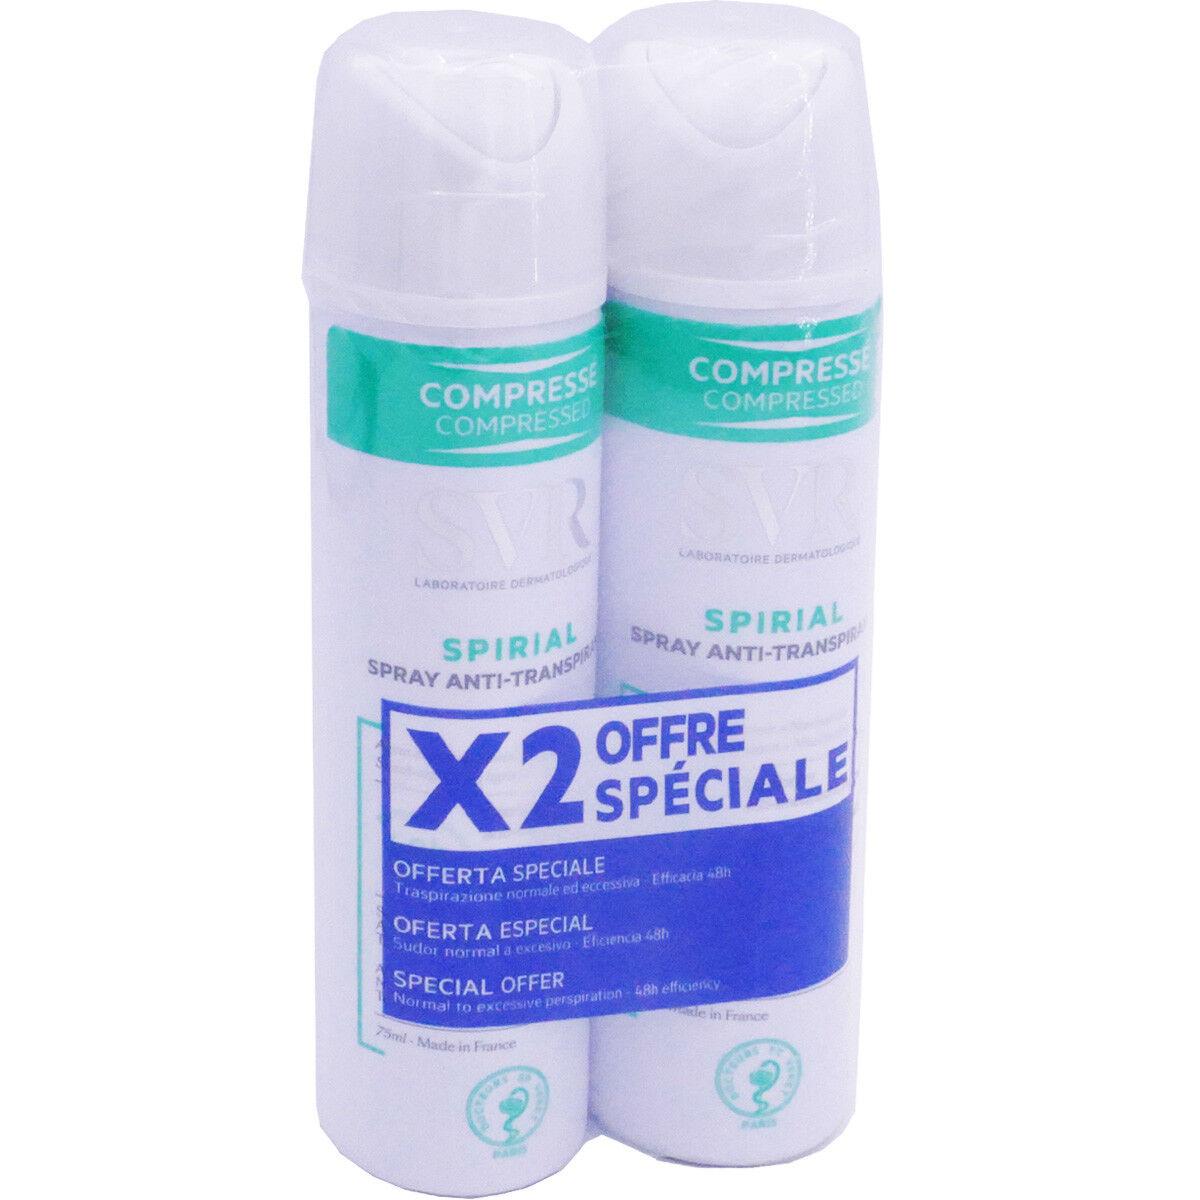 Svr spirial spray anti-transpirant 2x 75ml